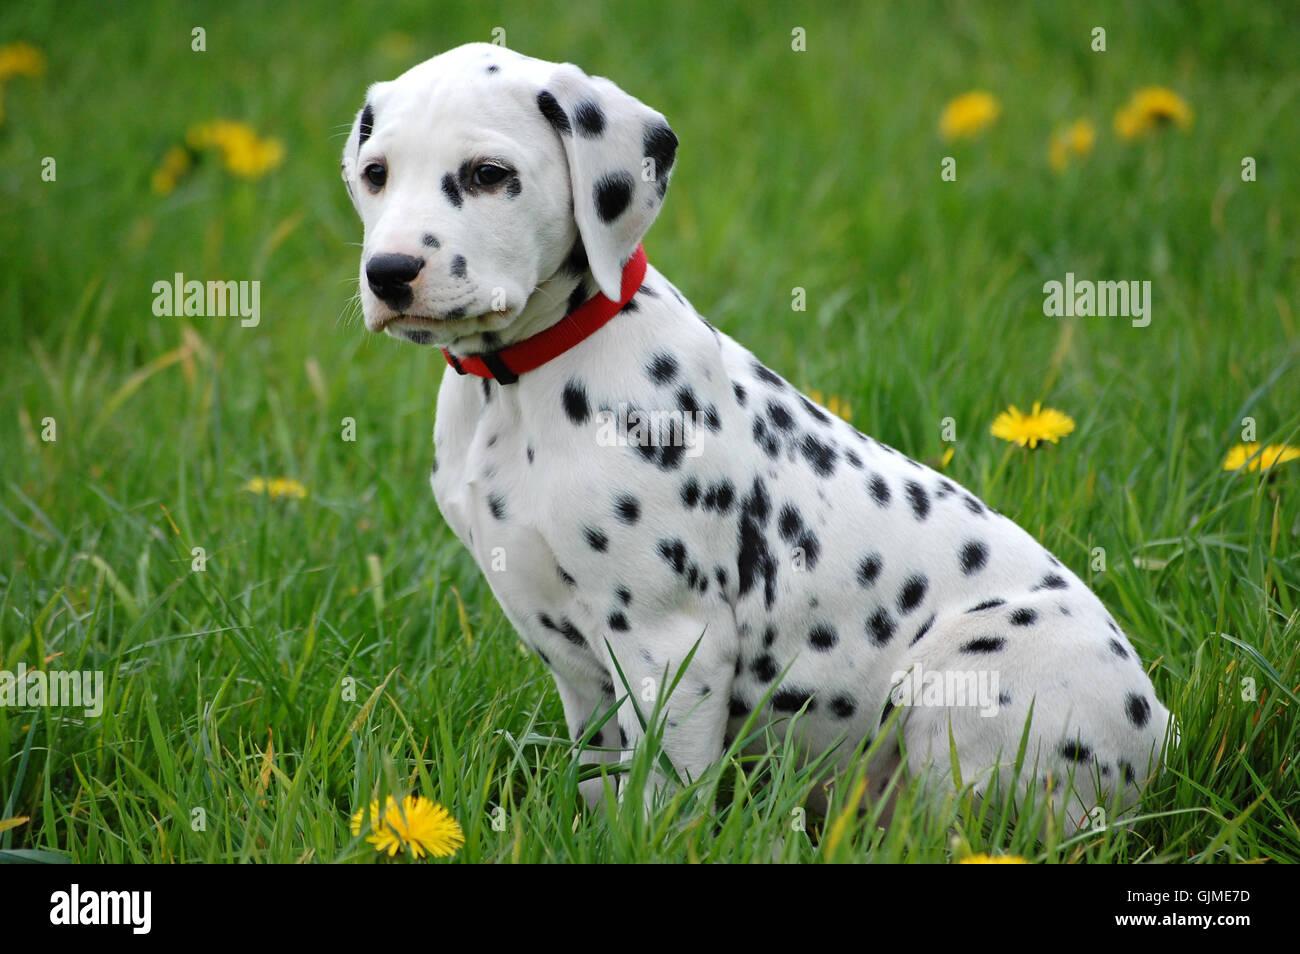 dog puppy dalmatian - Stock Image